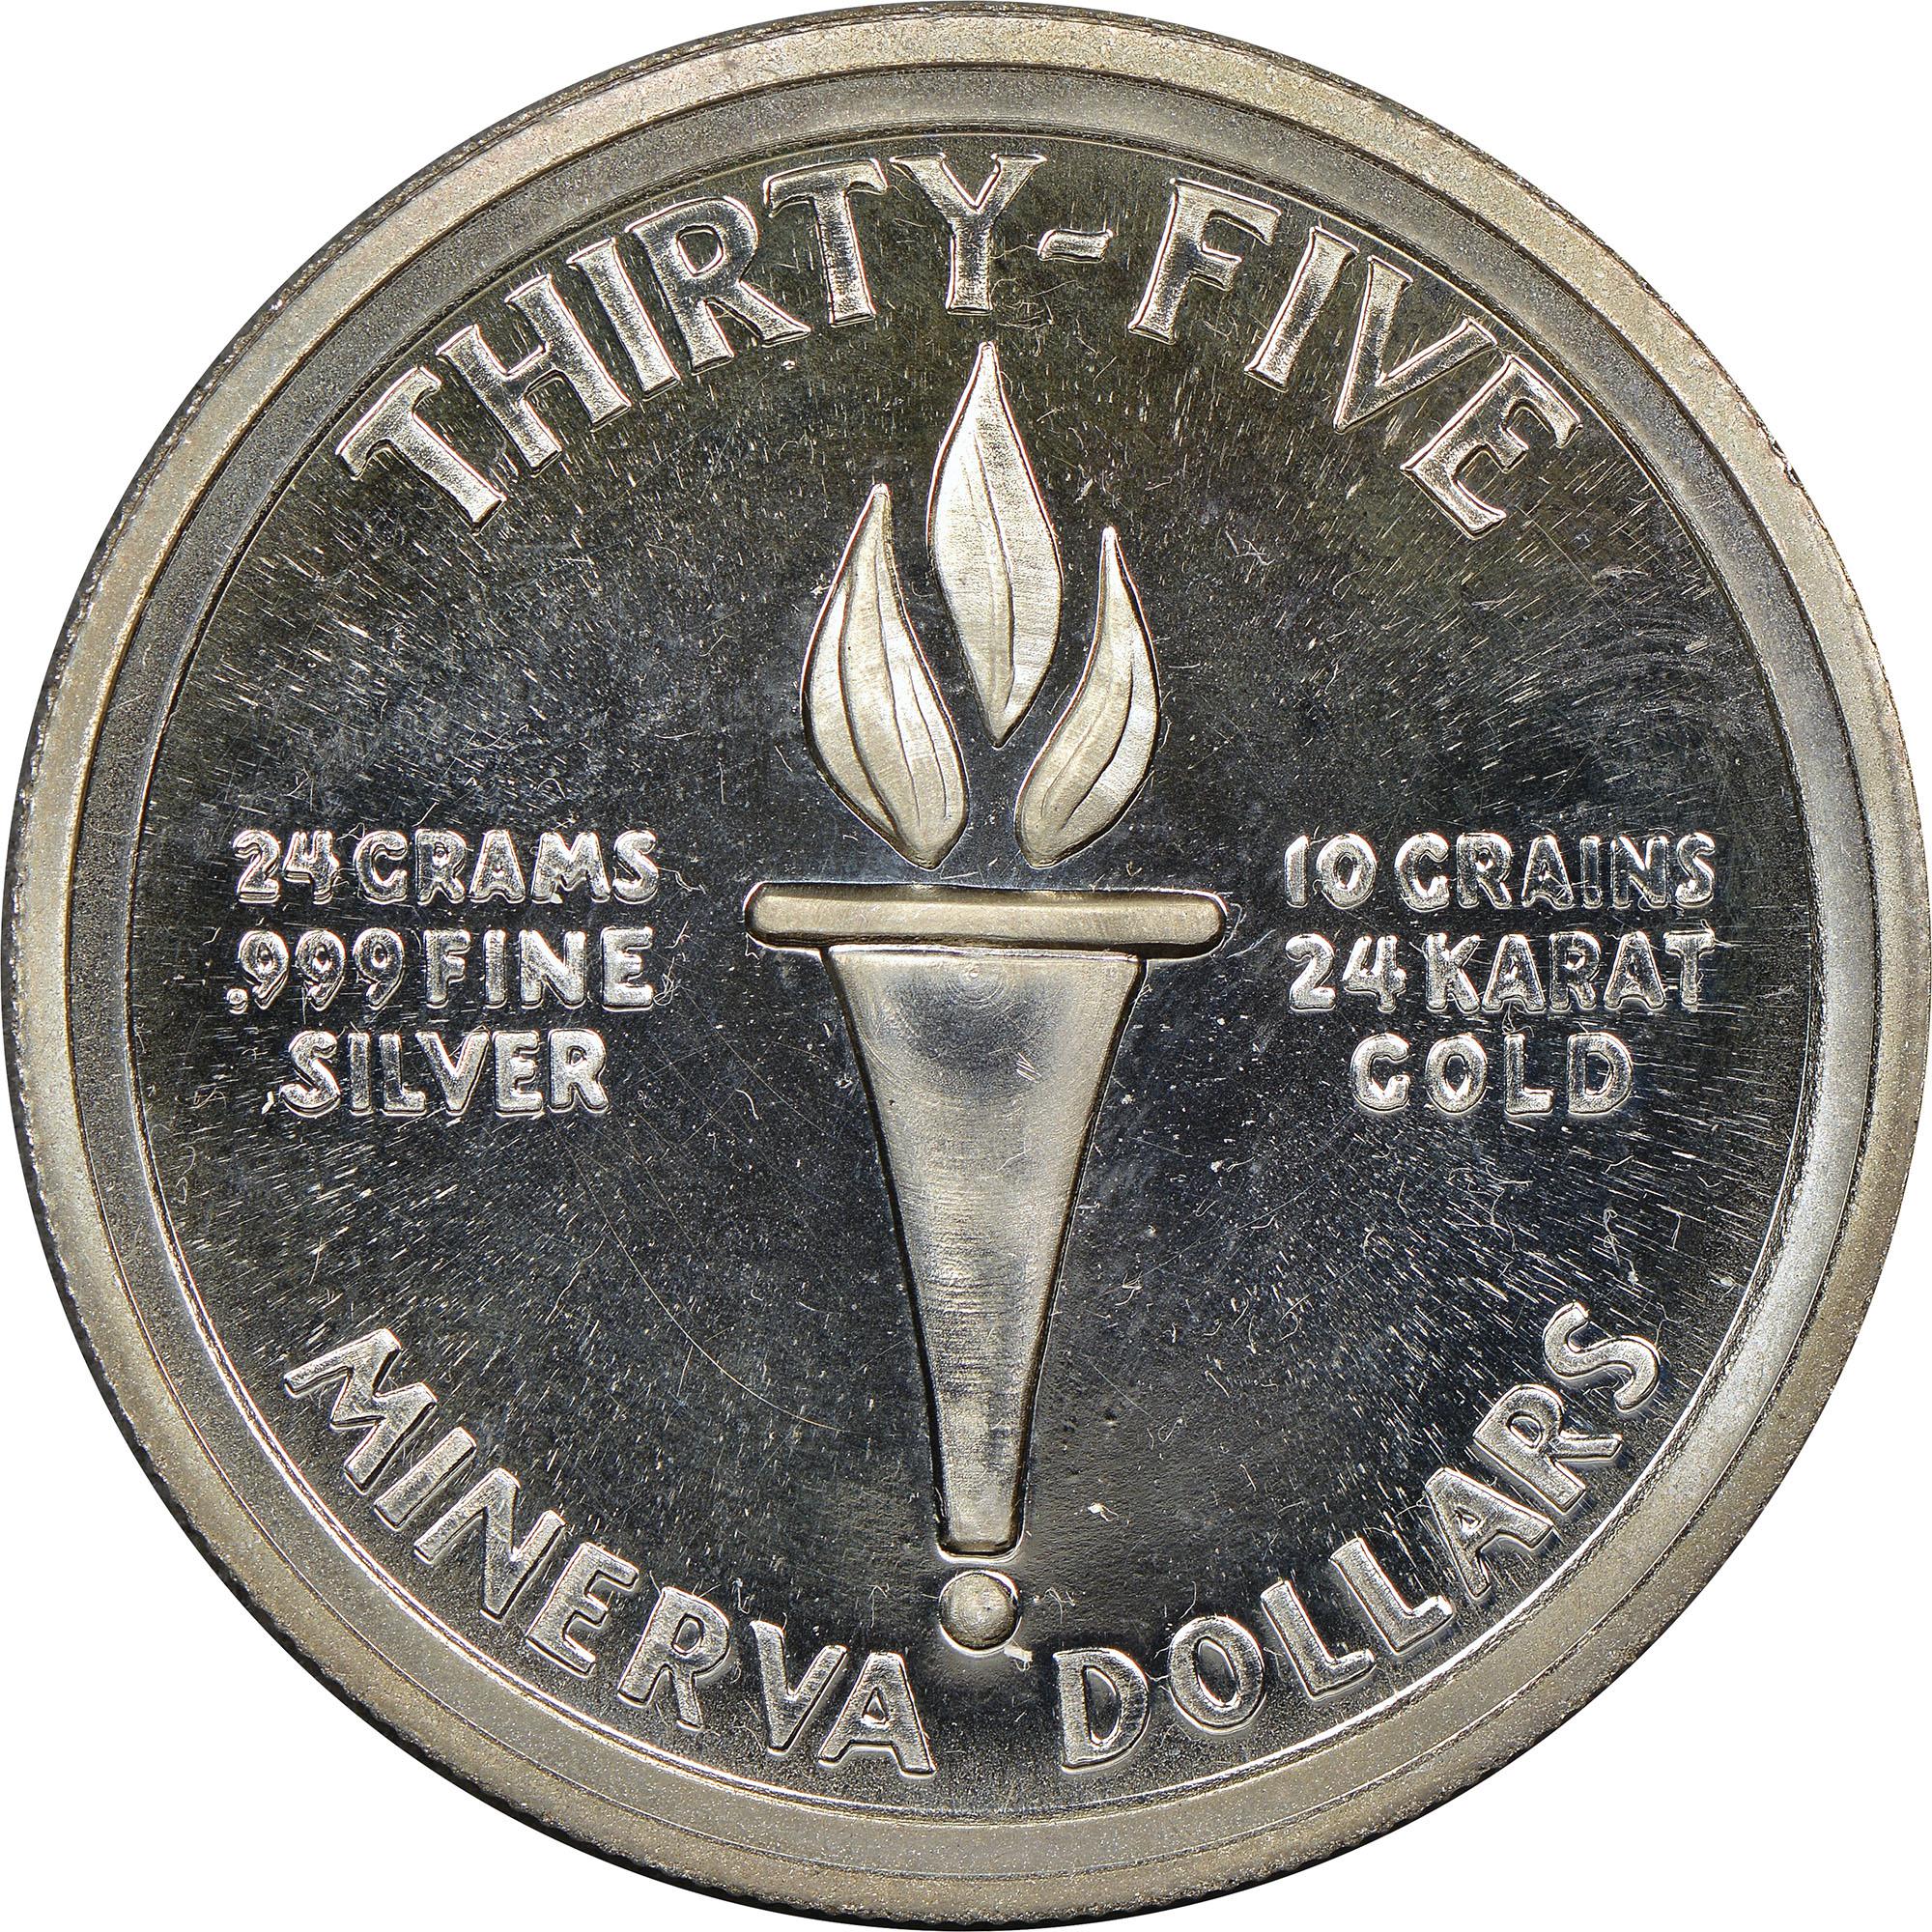 Minerva 35 Dollars reverse